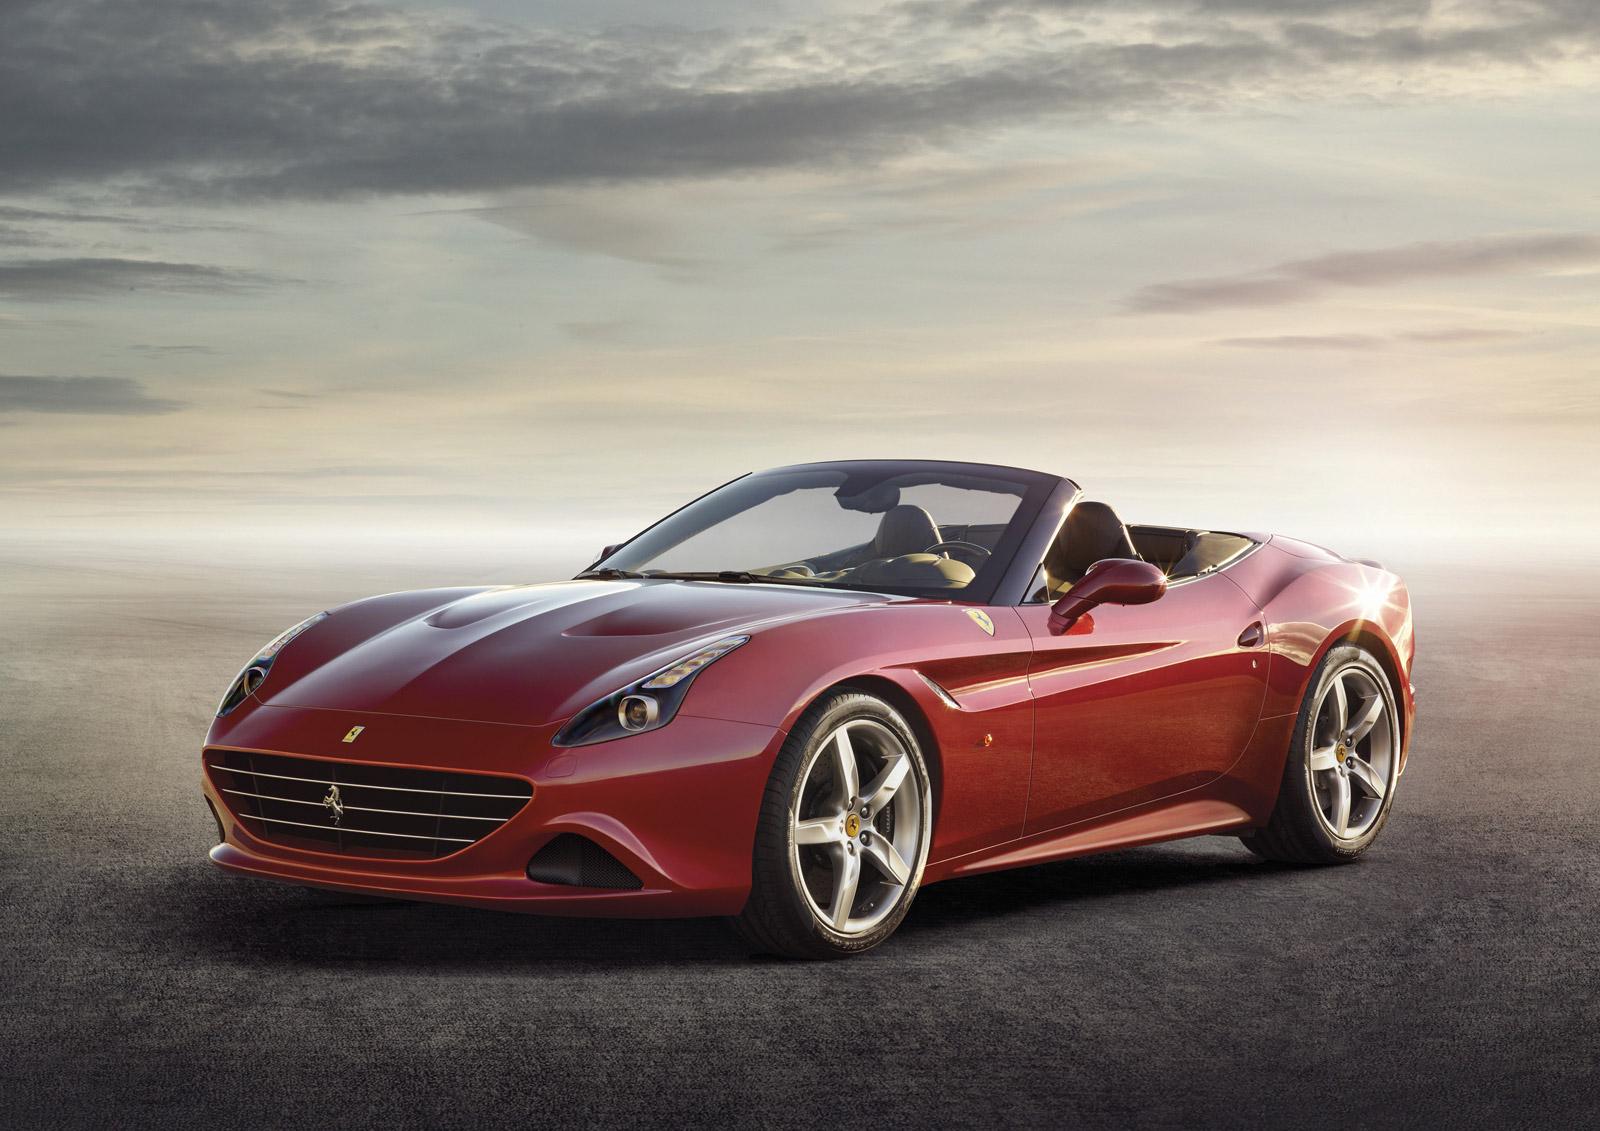 Turbocharged Ferrari California T Revealed: Video